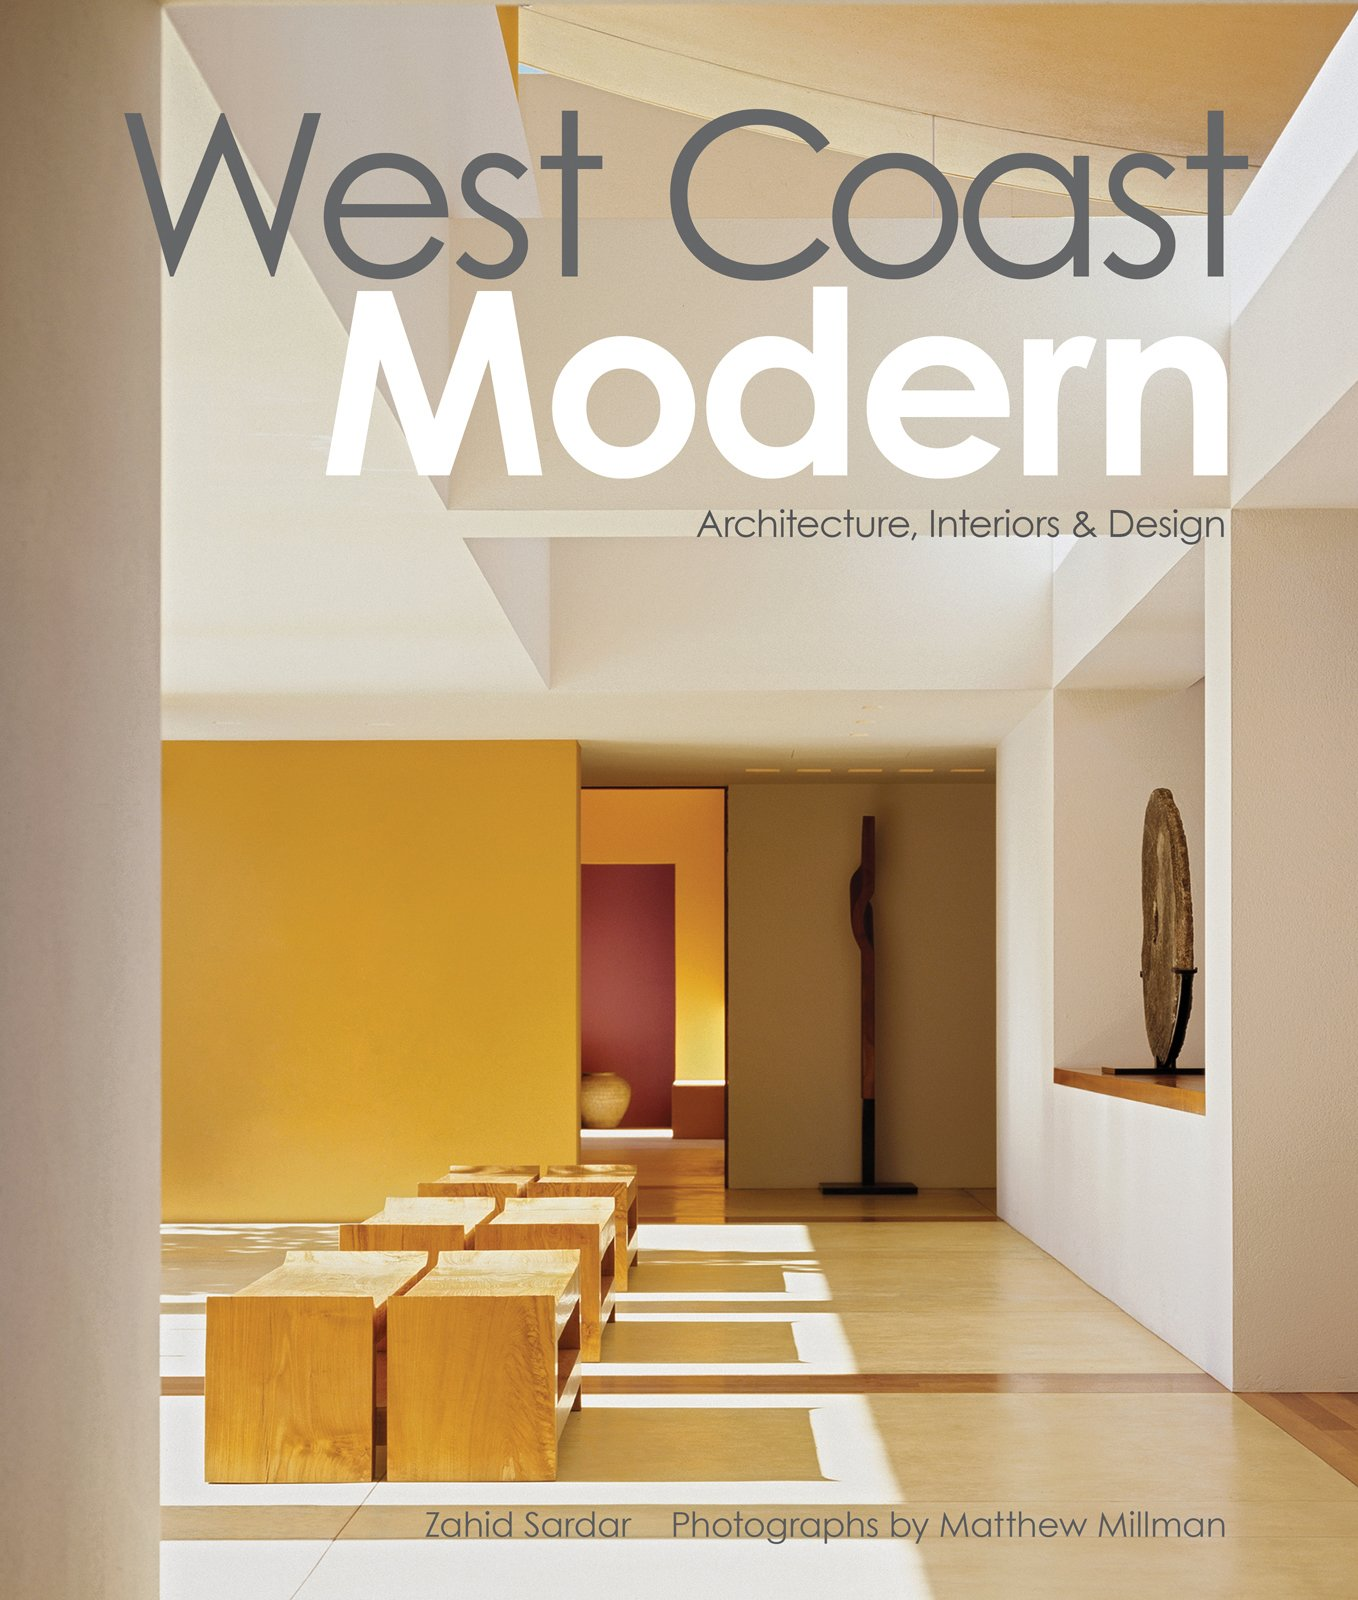 Photograph by Matthew Millman from West Coast Modern by Zahid Sardar, reprint permission by Gibbs Smith Publisher.  Photo 1 of 5 in 'West Coast Modern' by Zahid Sardar